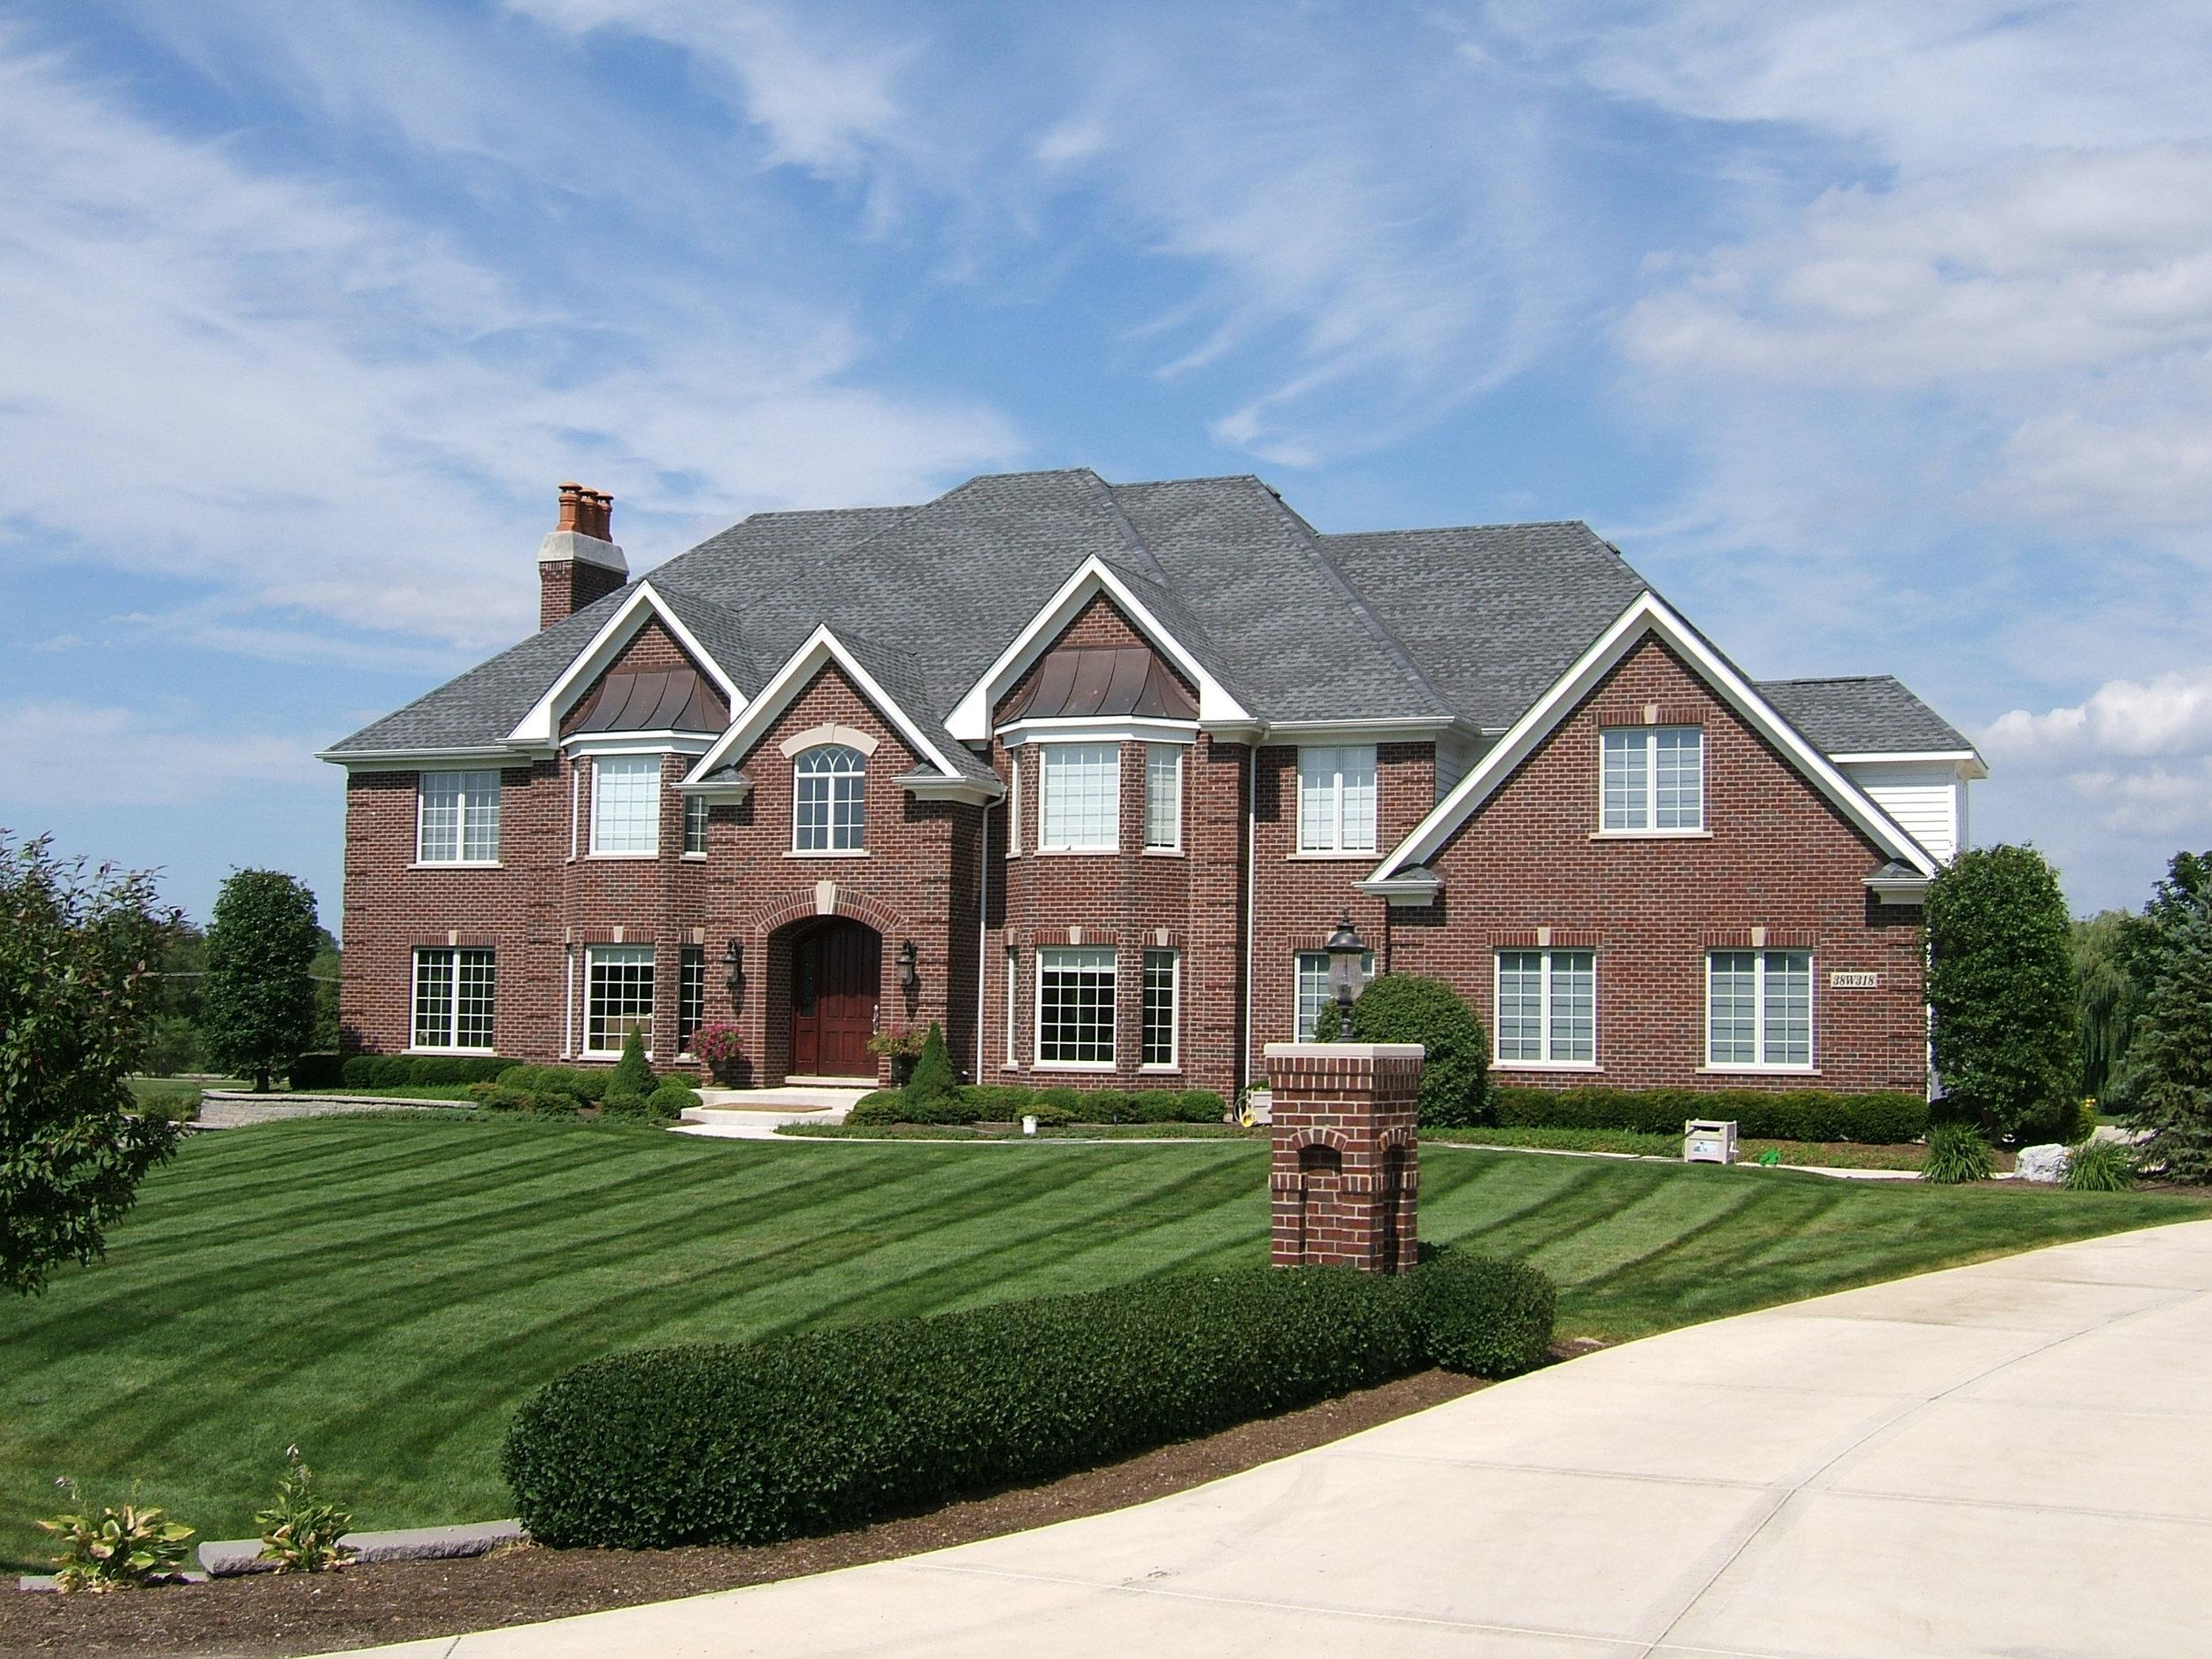 Burr Hill Custom Home. St. Charles IL 60175. Black Hawk Country Club